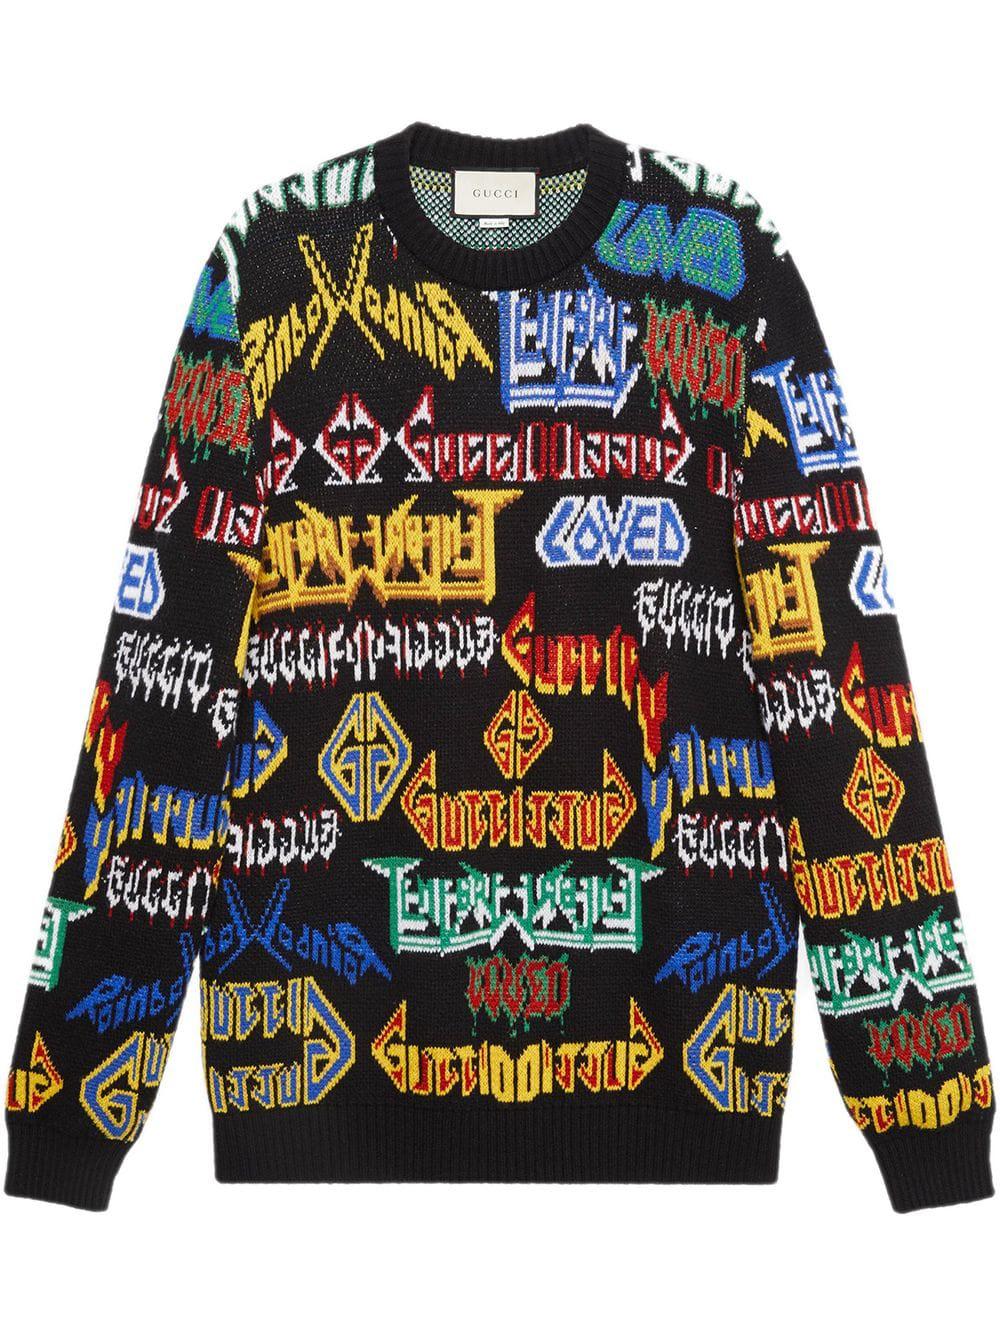 5648973ebd2 Gucci Men s Medley Logo Intarsia-Knit Sweater In Black